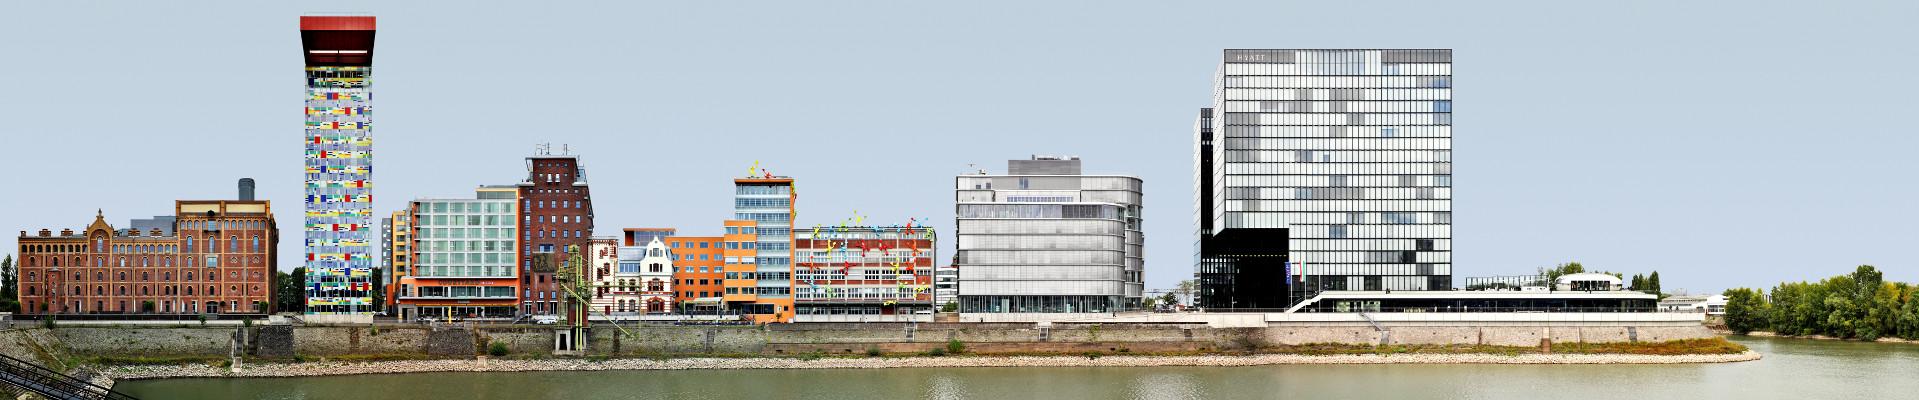 Medienhafen in Düsseldorf, Germany